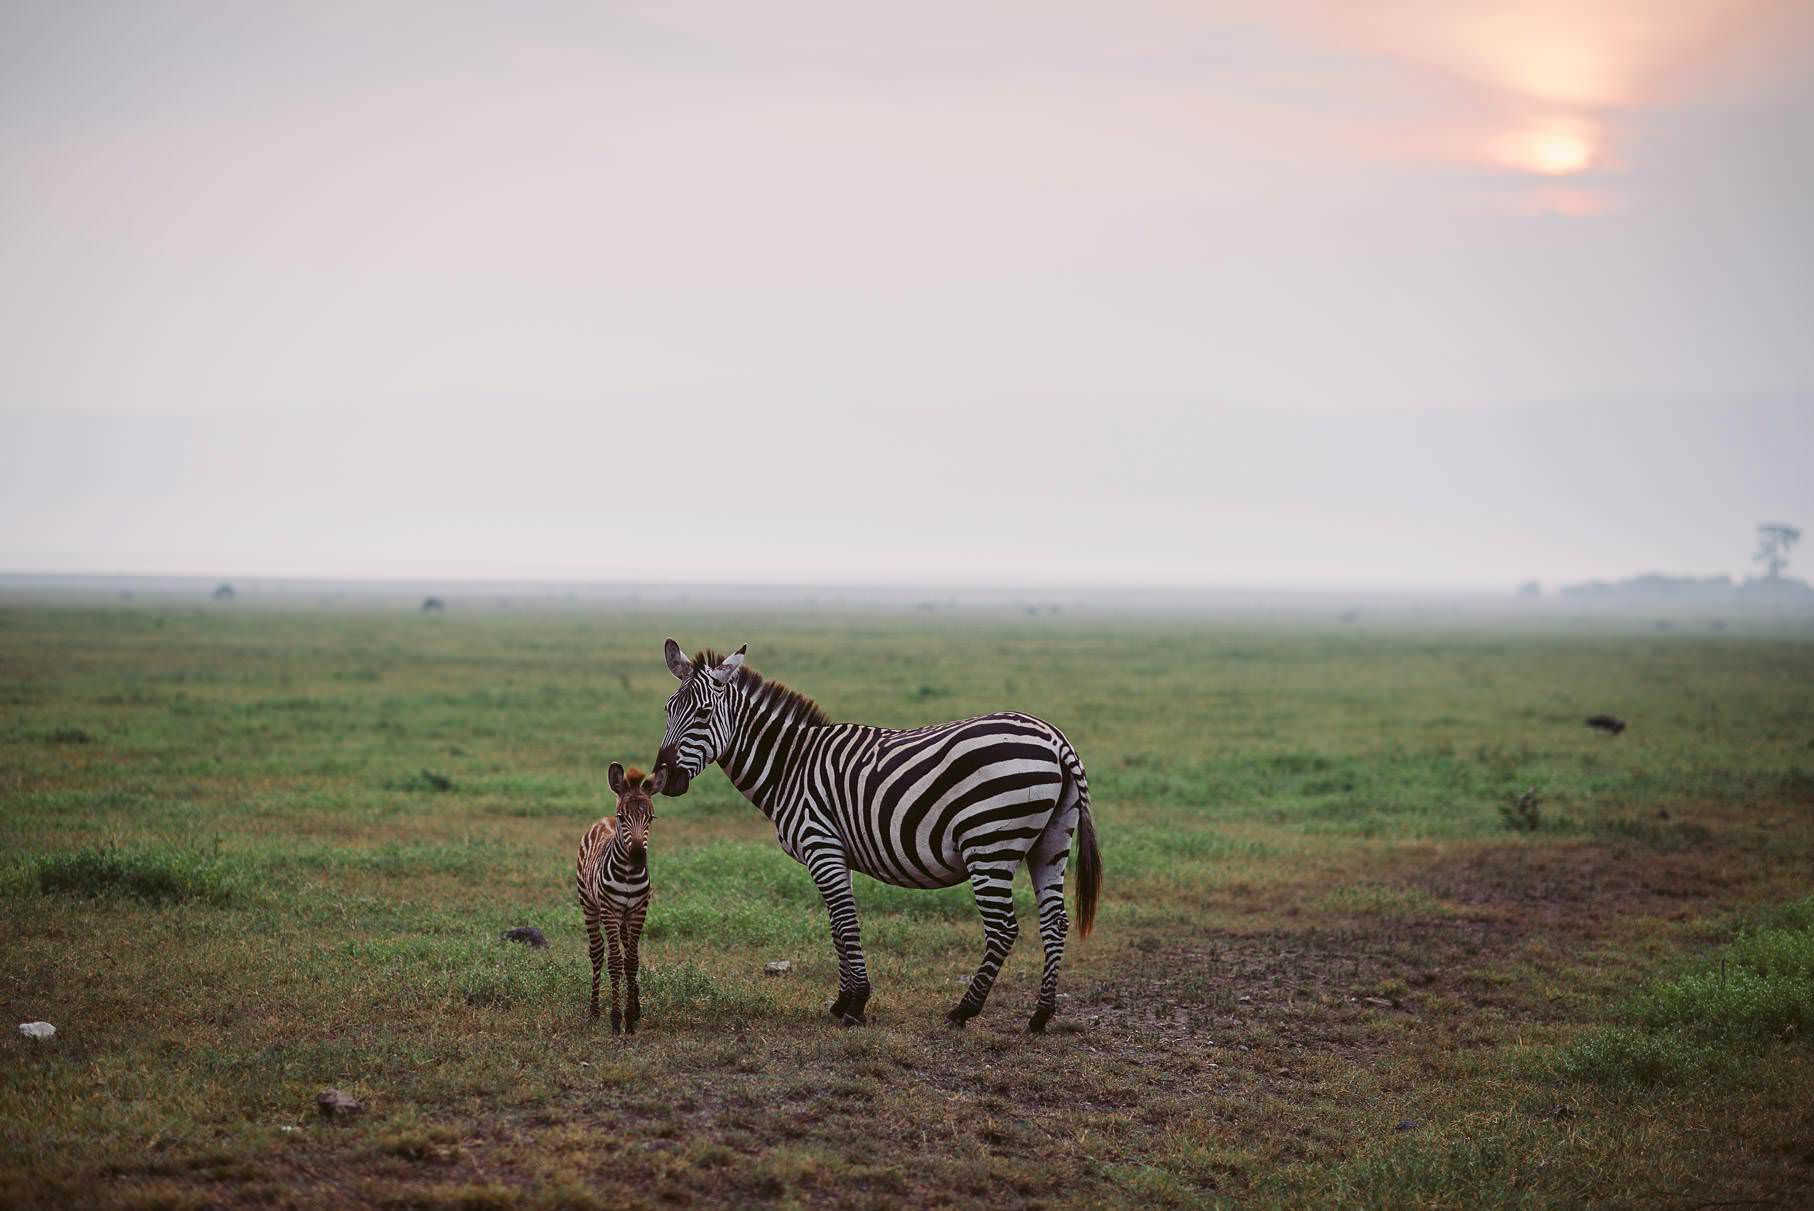 0051 tansania nd8 1383 anne bjoern fotografie hochzeitsfotograf hamburg - This is Tanzania - Serengeti, Kilimanjaro & Sansibar